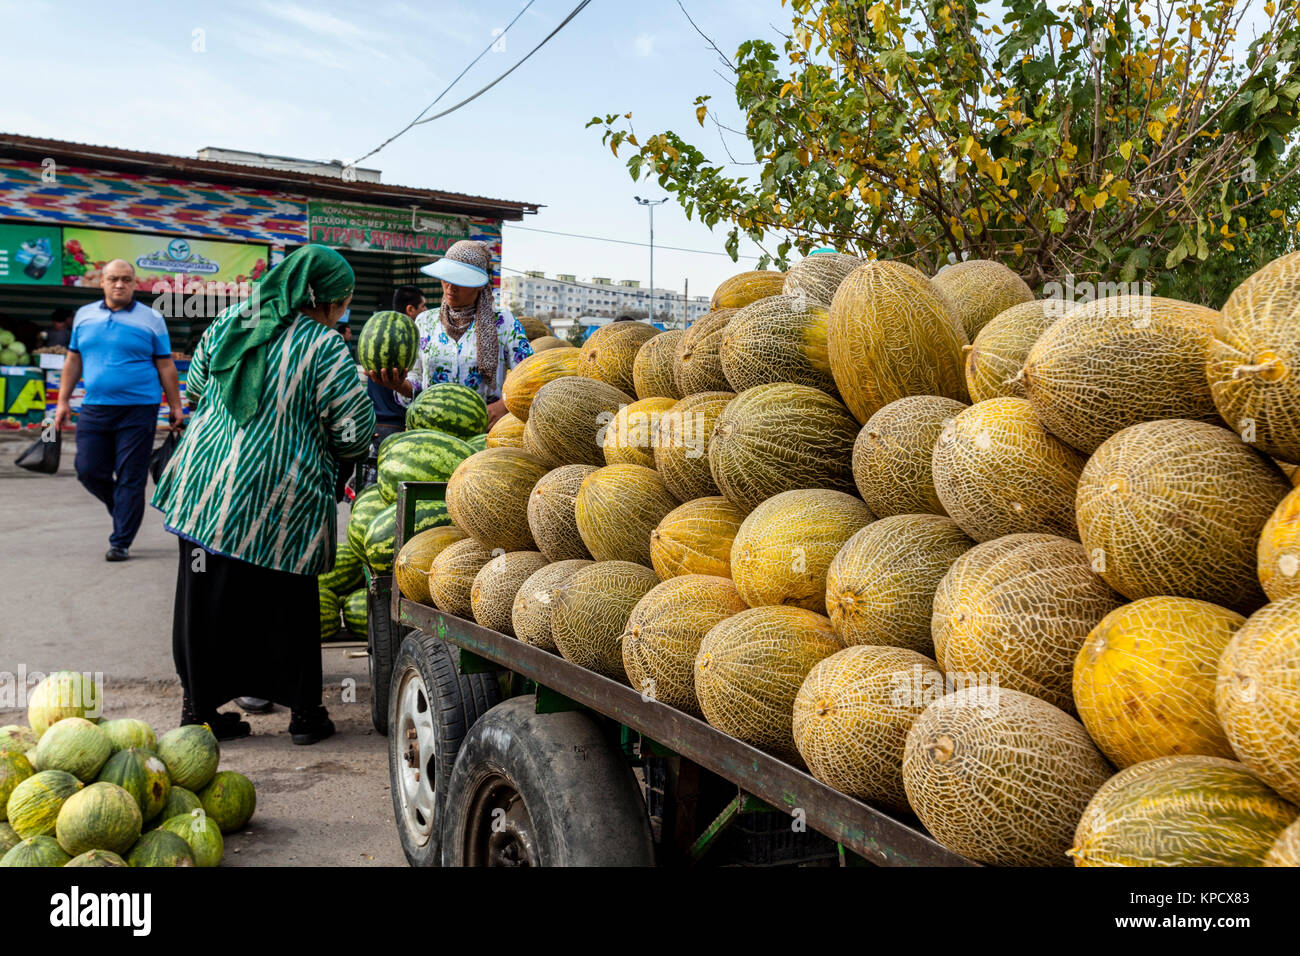 Image result for chorsu bazaar tashkent alamy